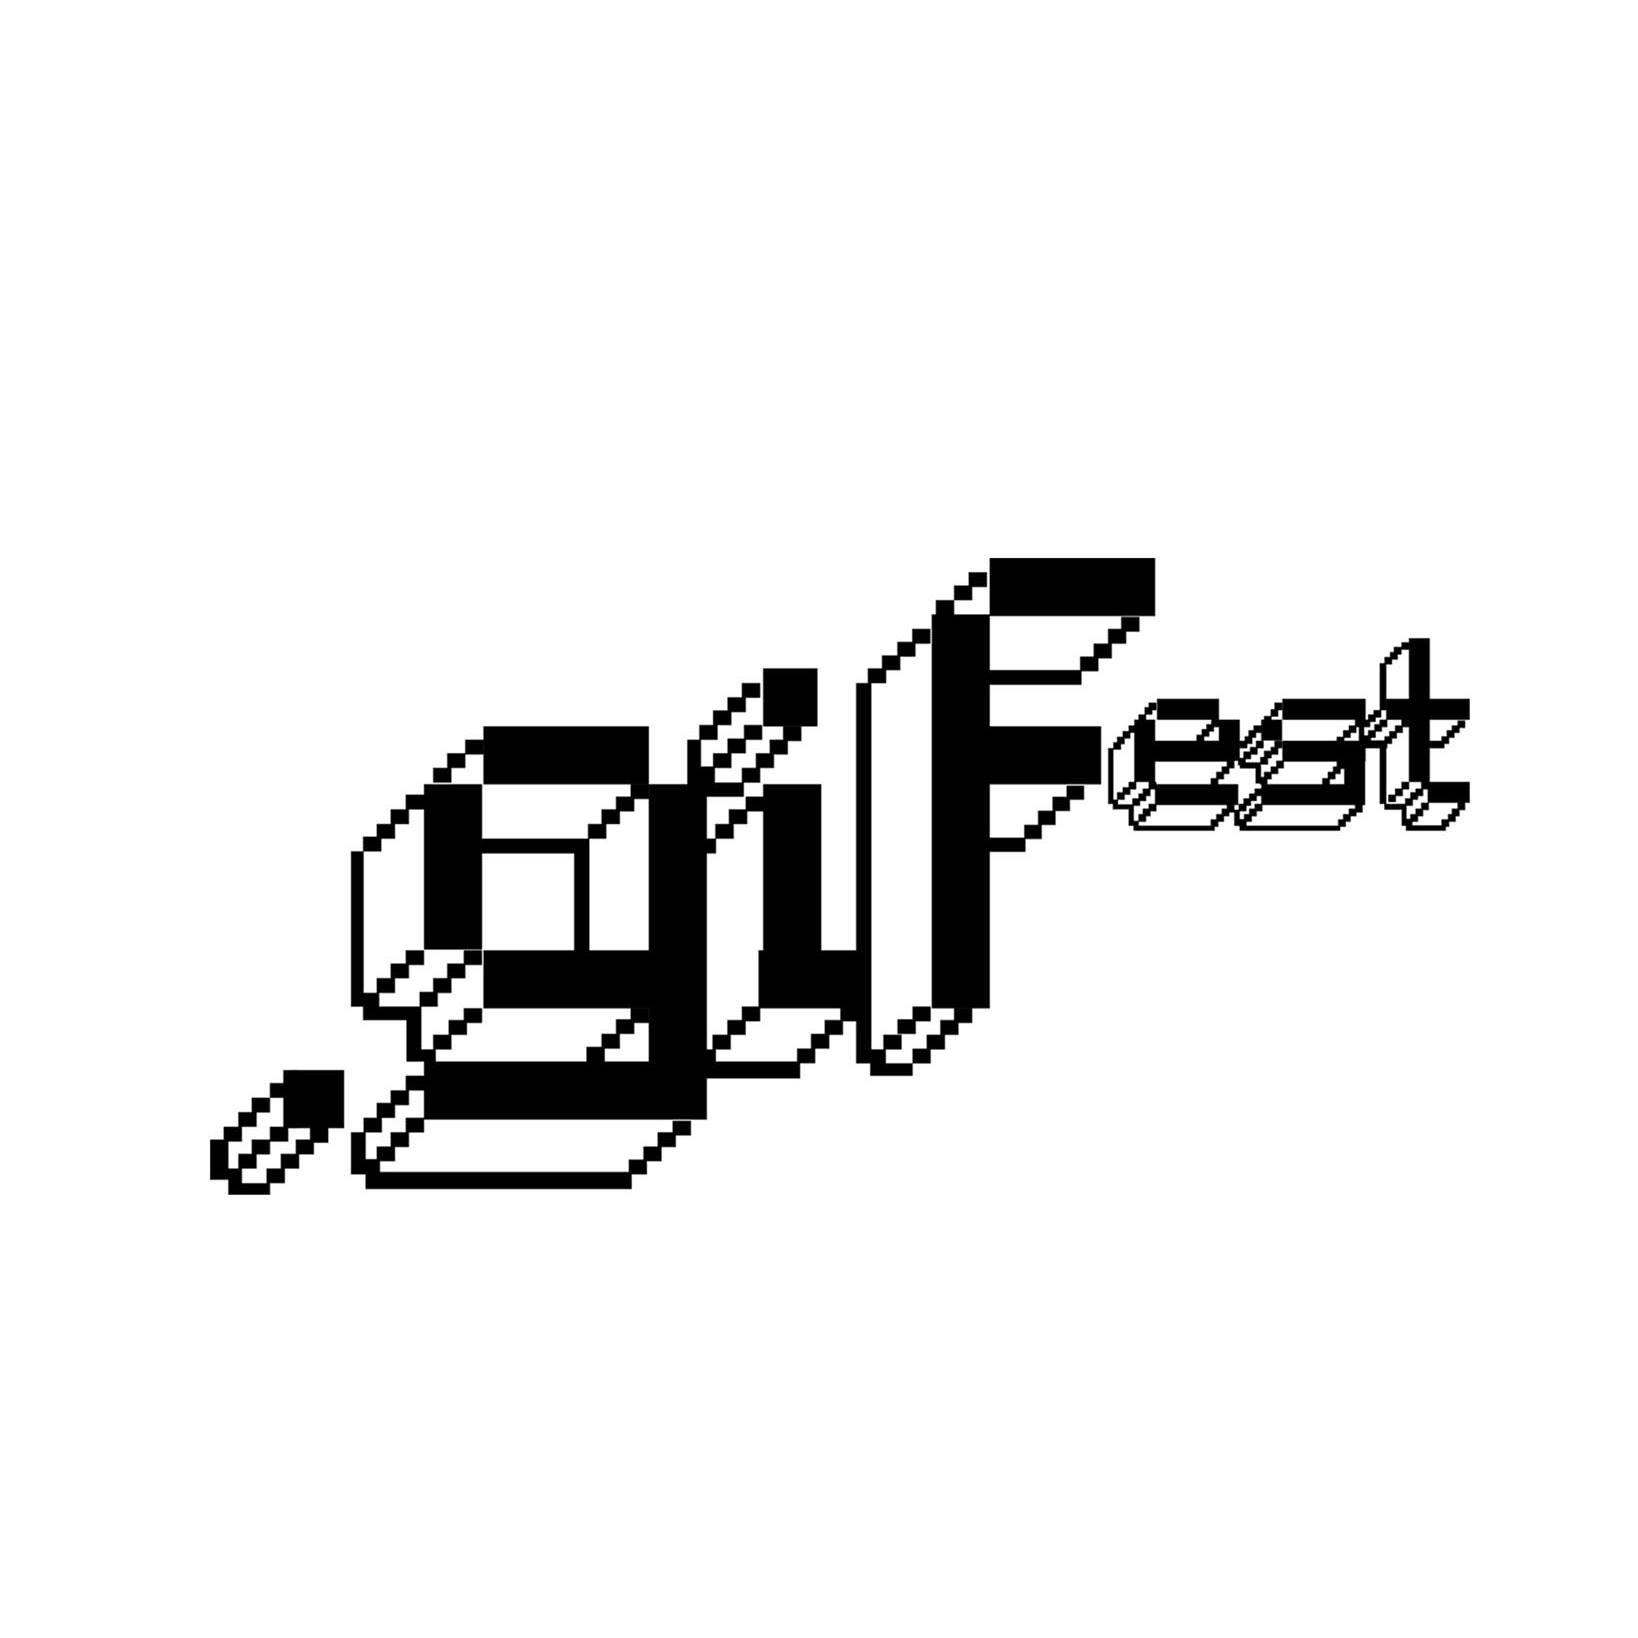 Natječaj za regionalni festival animiranog gif-a - GIFEST#9